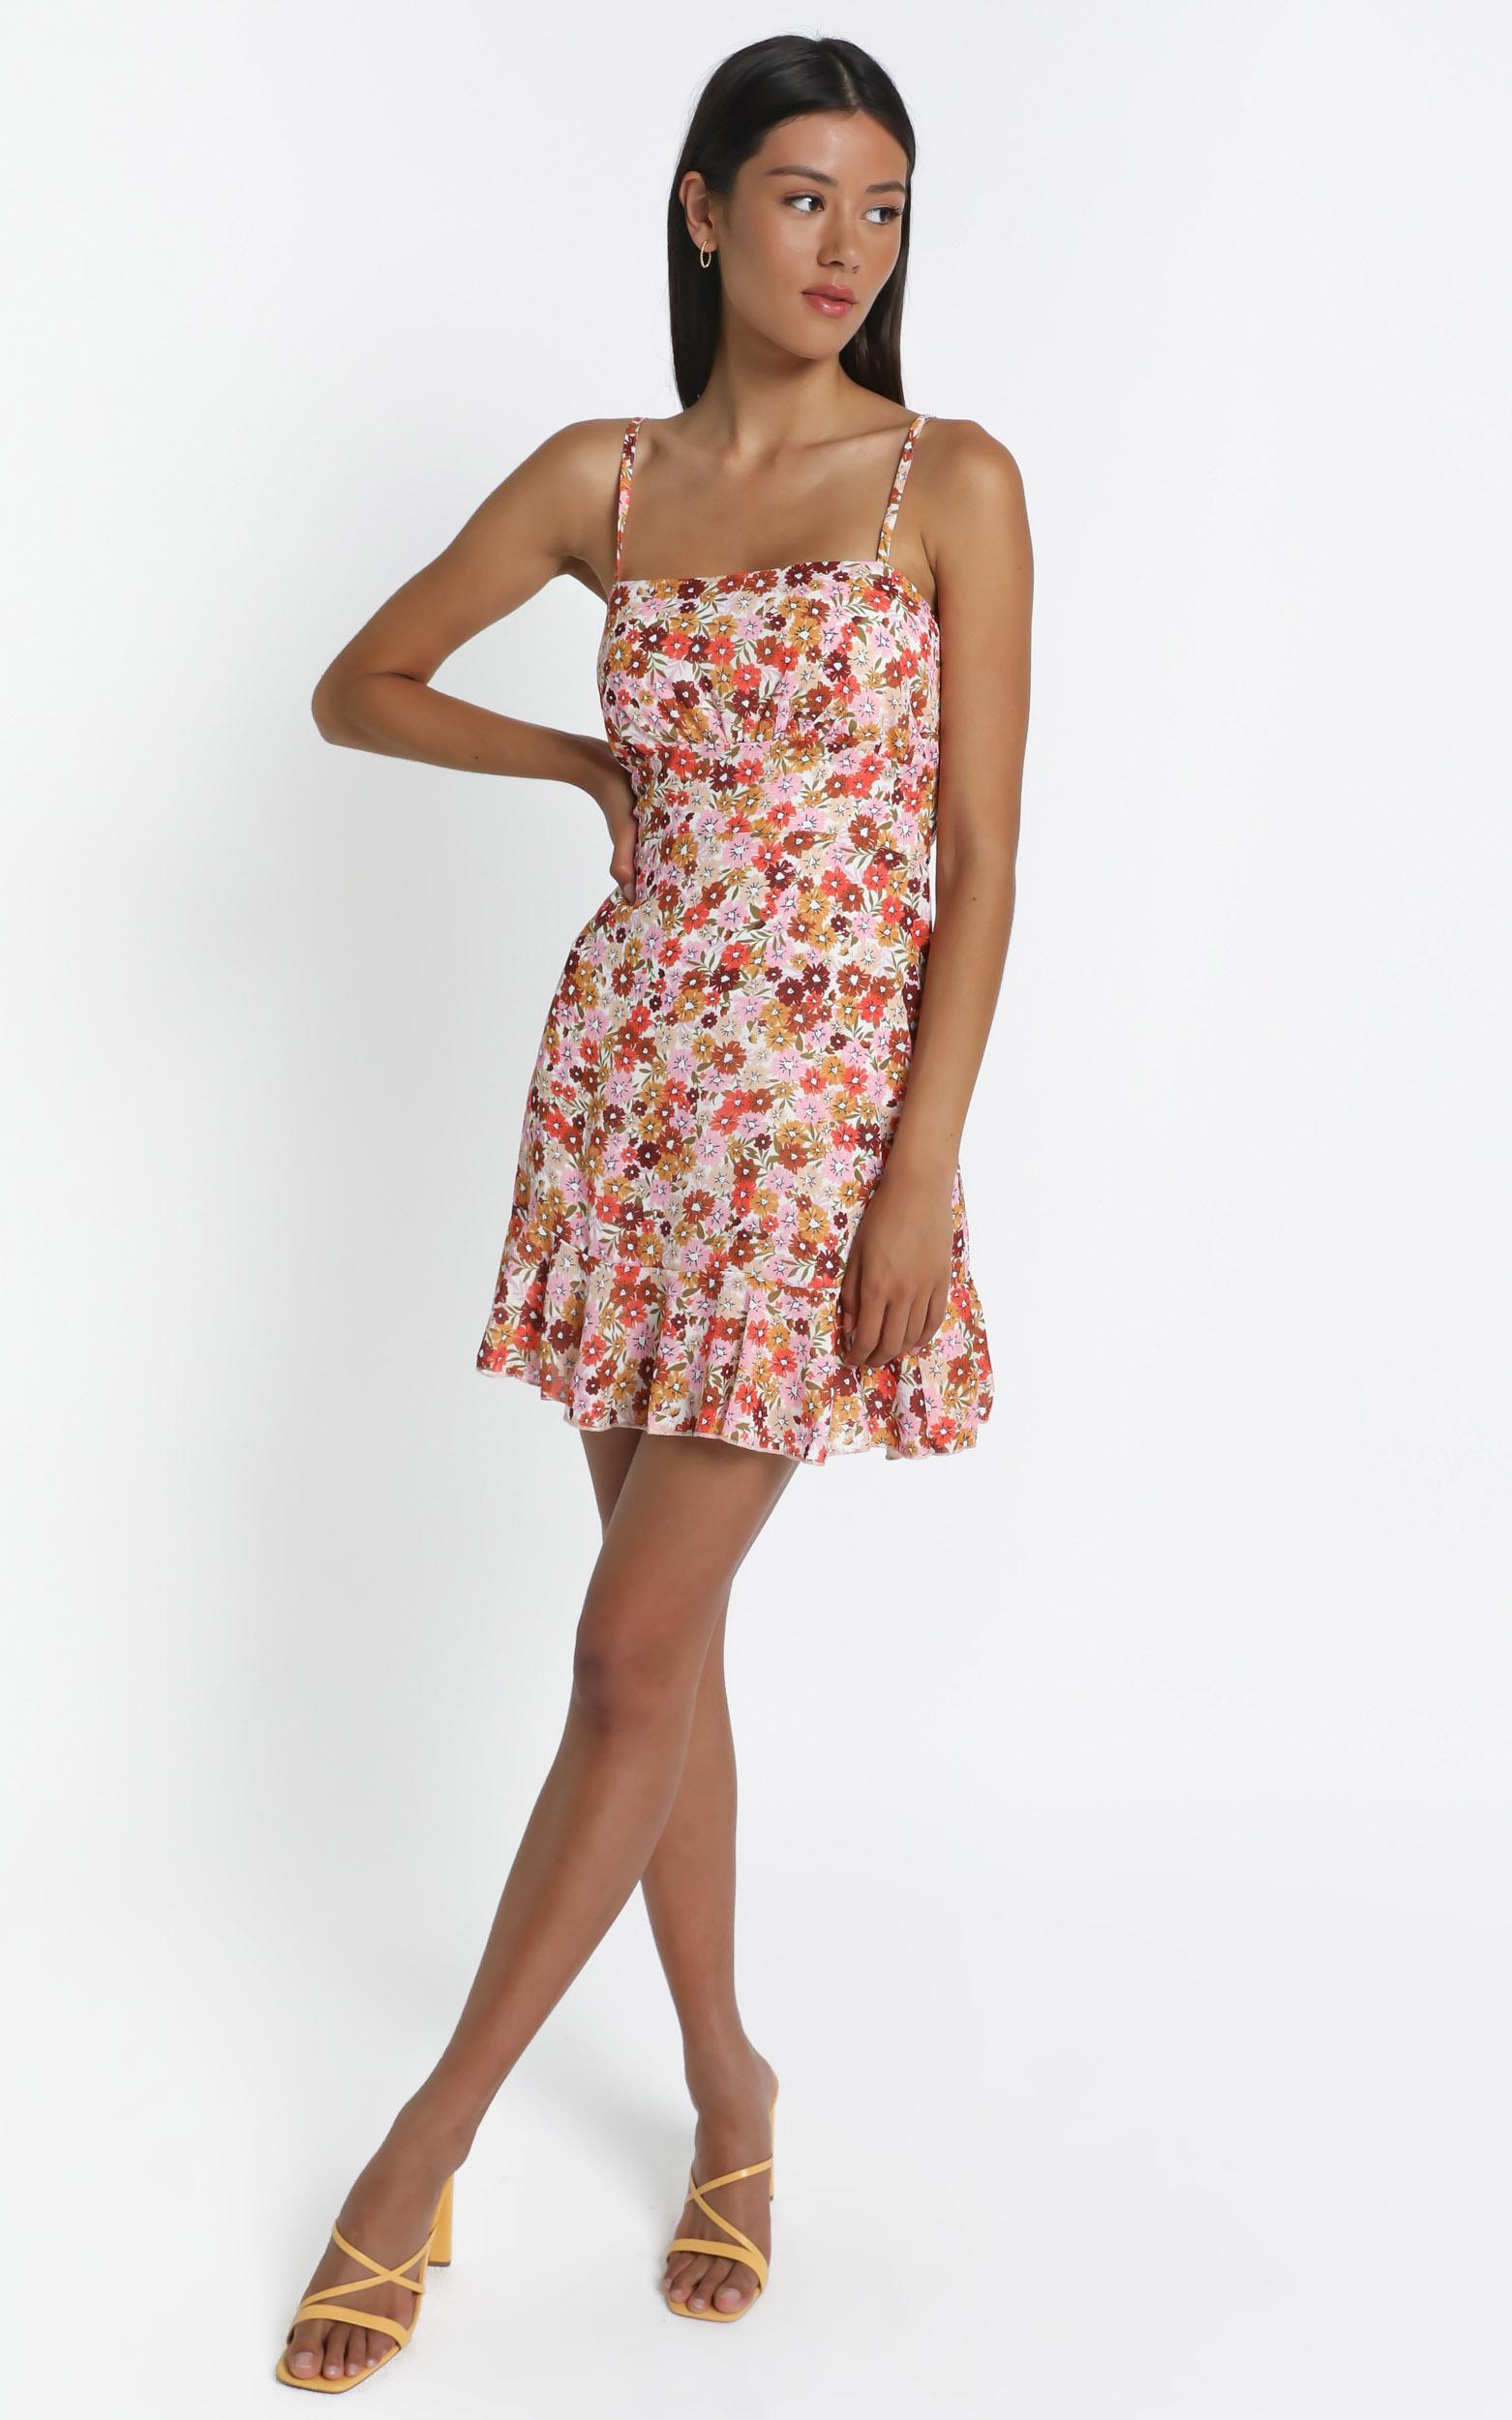 Falling In Love Dress In Sahara Ditsy Floral Print- 6 (XS), Orange, hi-res image number null